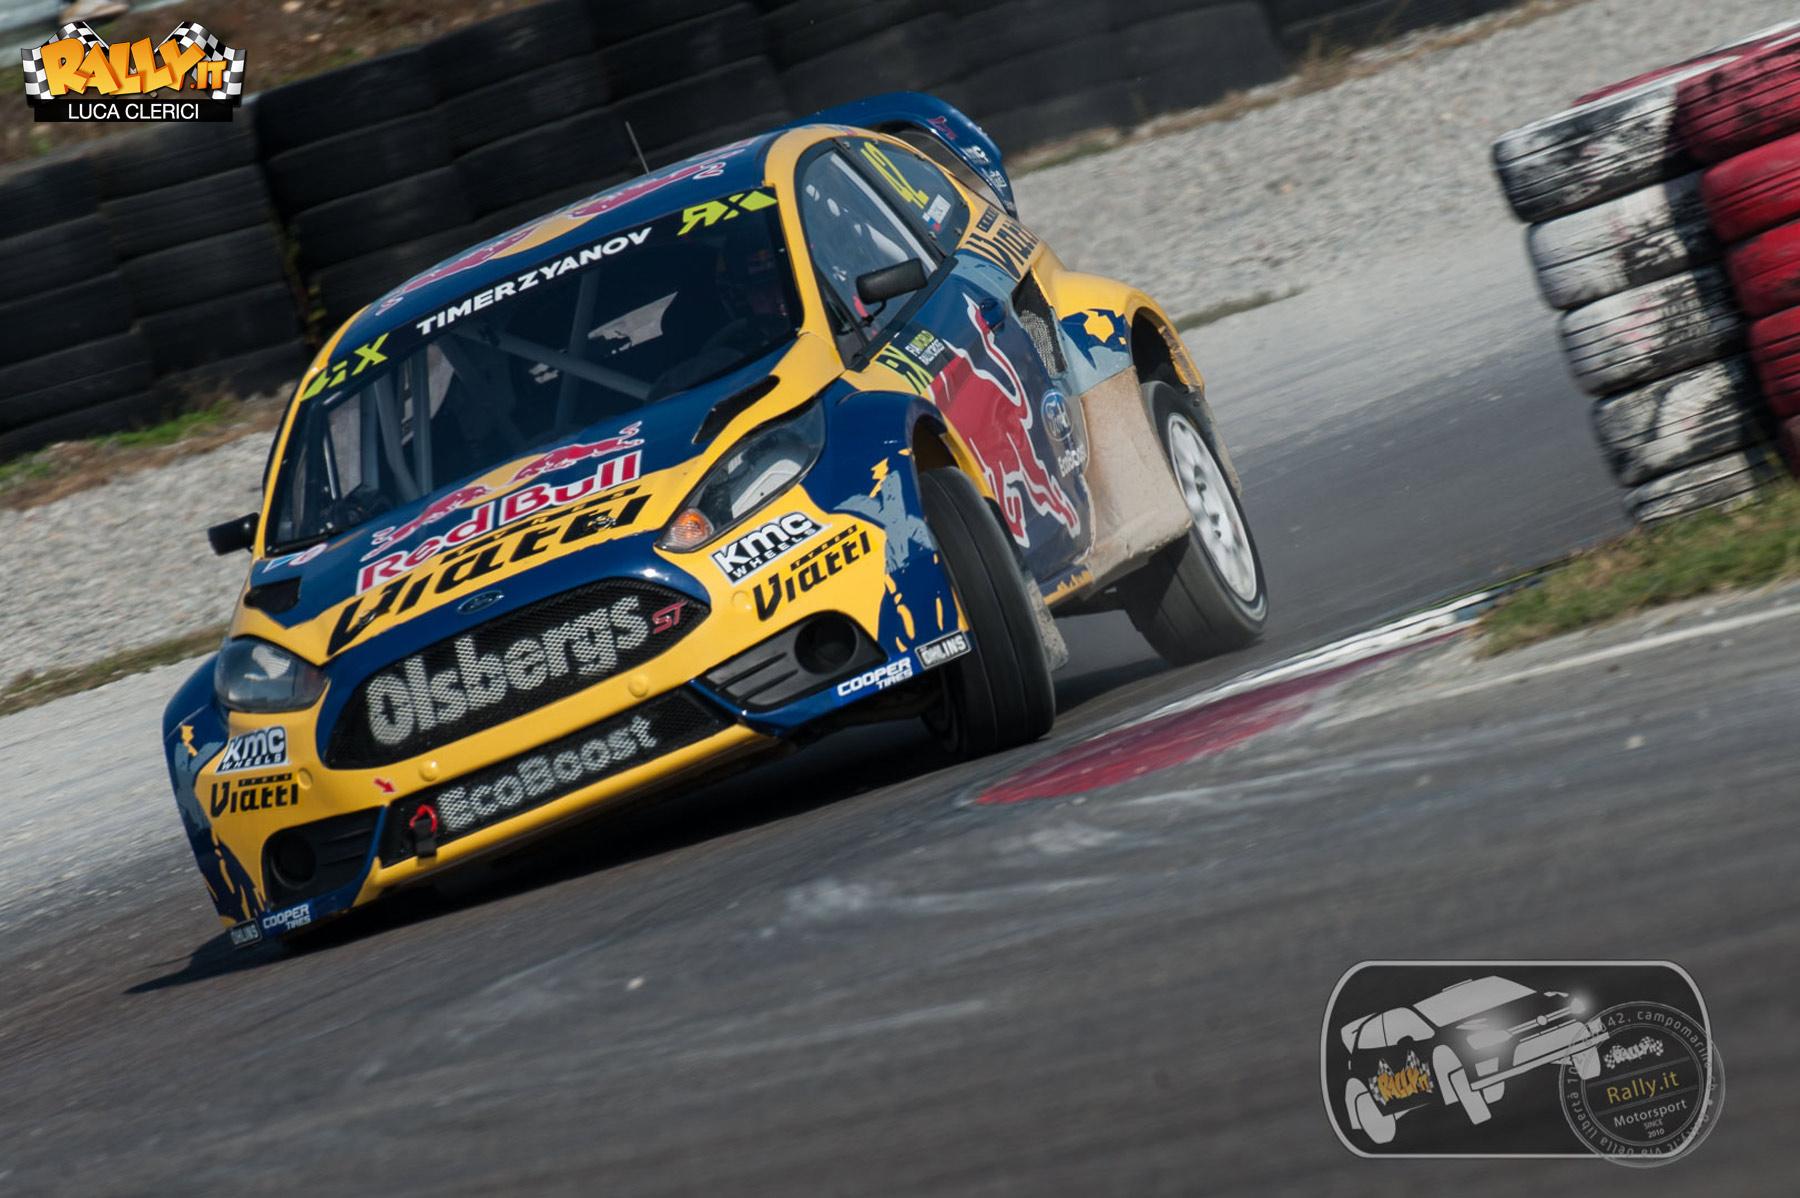 215-Rallycross Franciacorta RX-2015.jpg